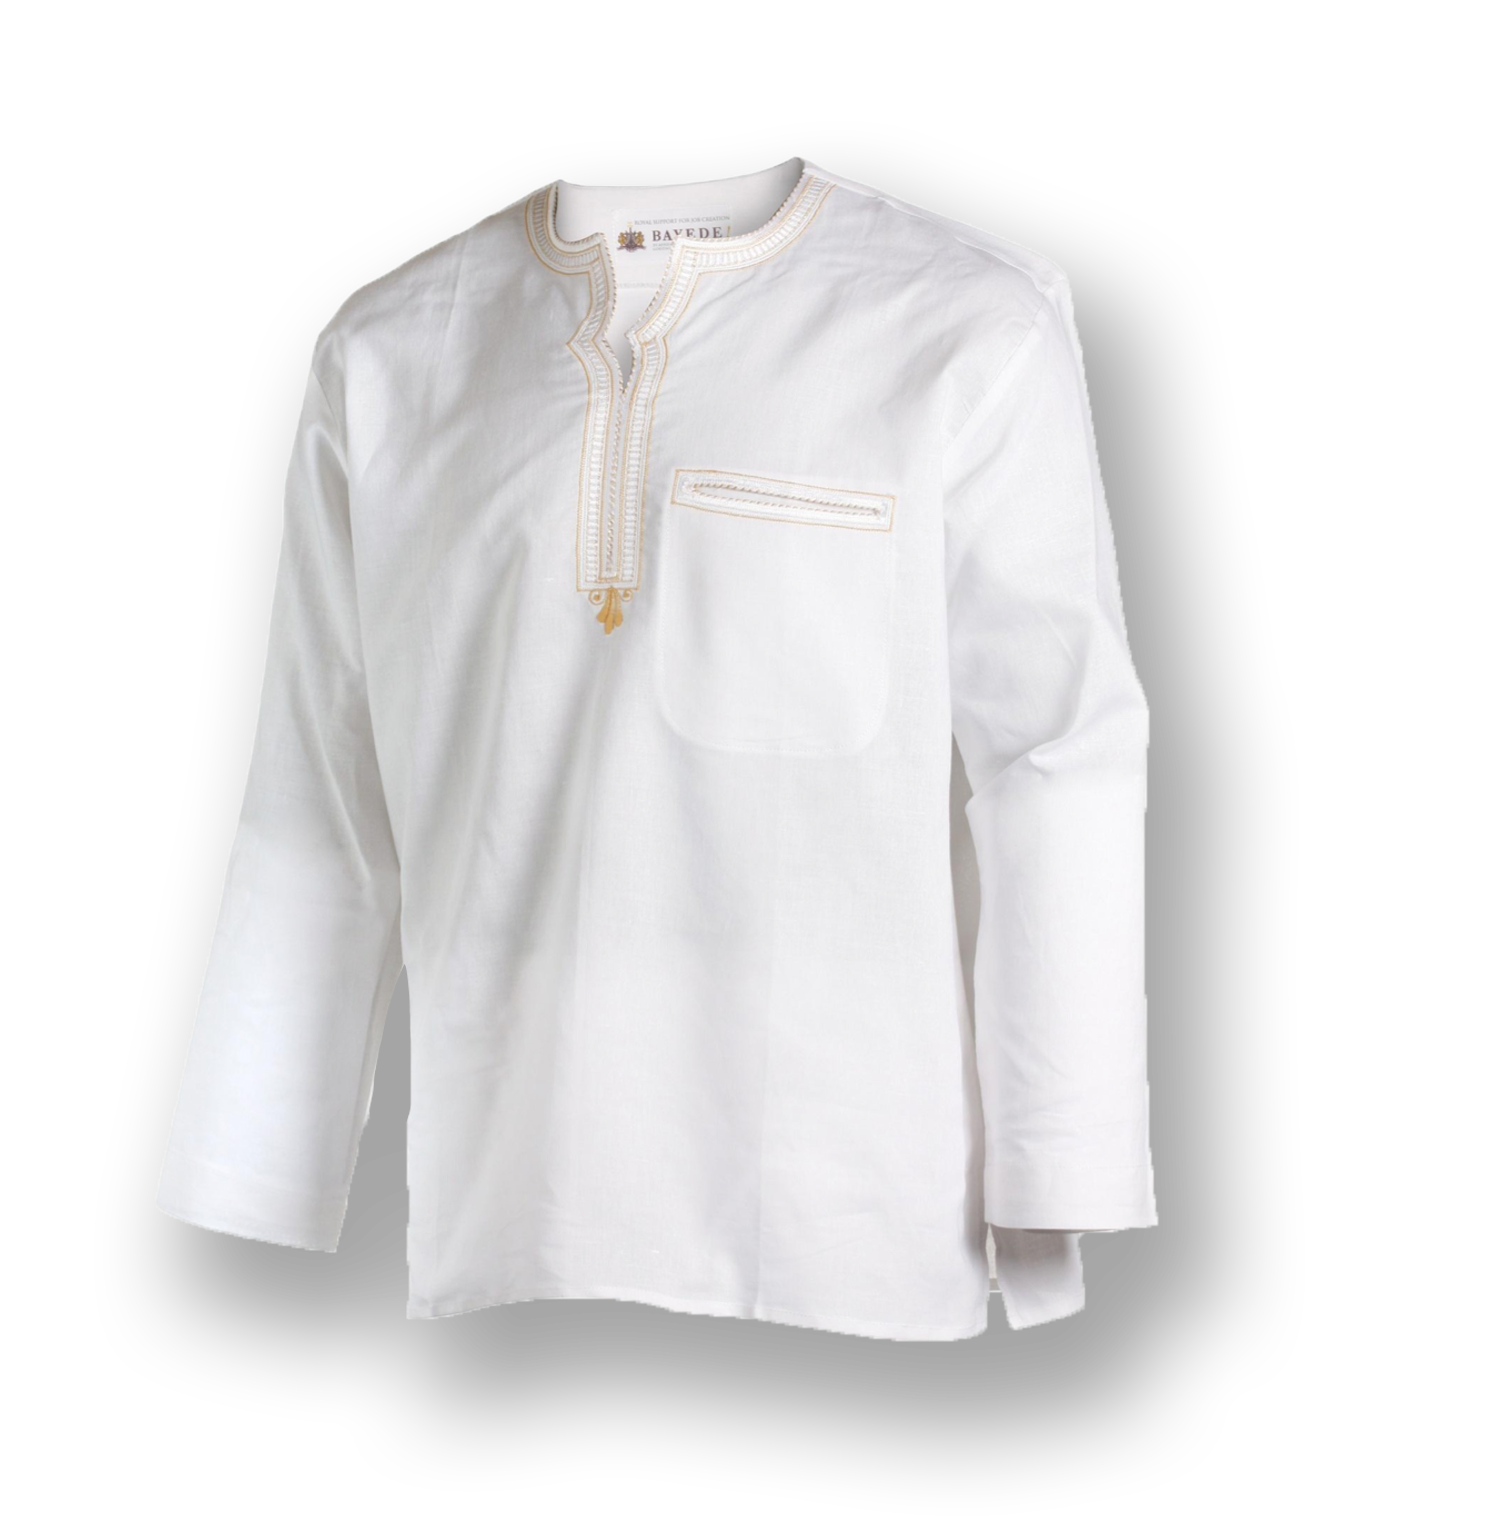 Bayede! Cream Ethnic Shirt